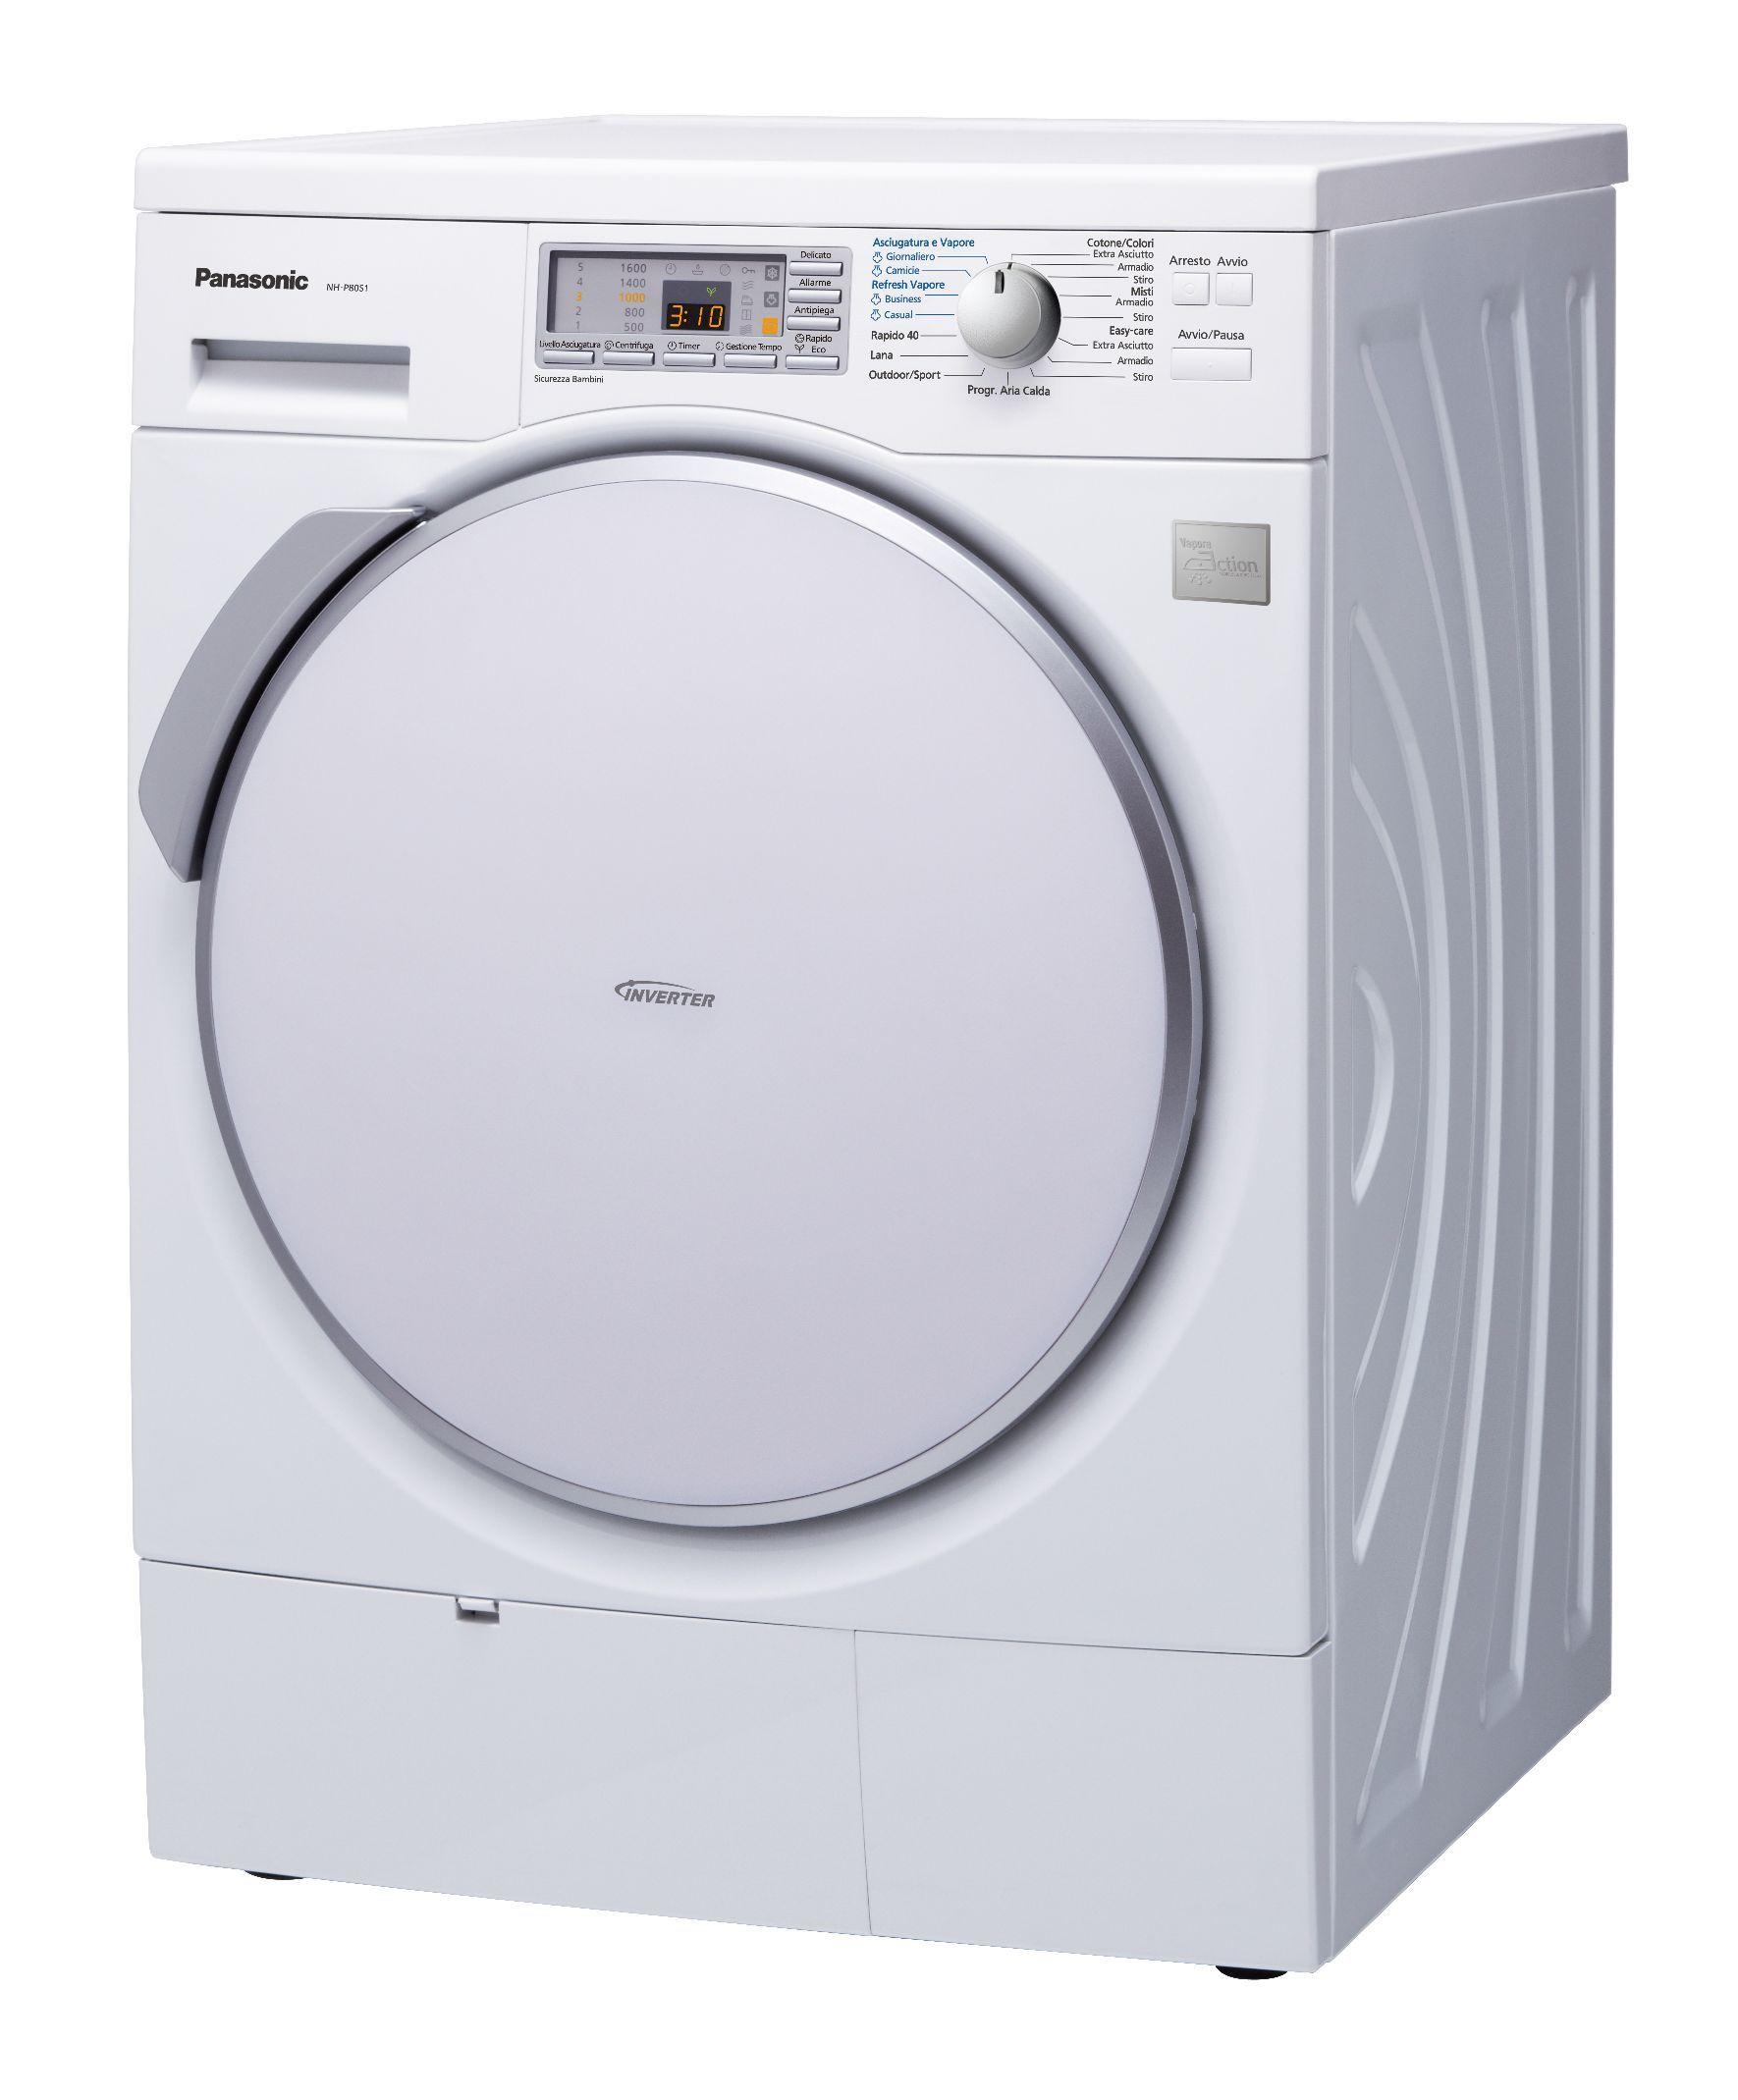 Lavatrice con vapore Panasonic Lavatrice, Vapore